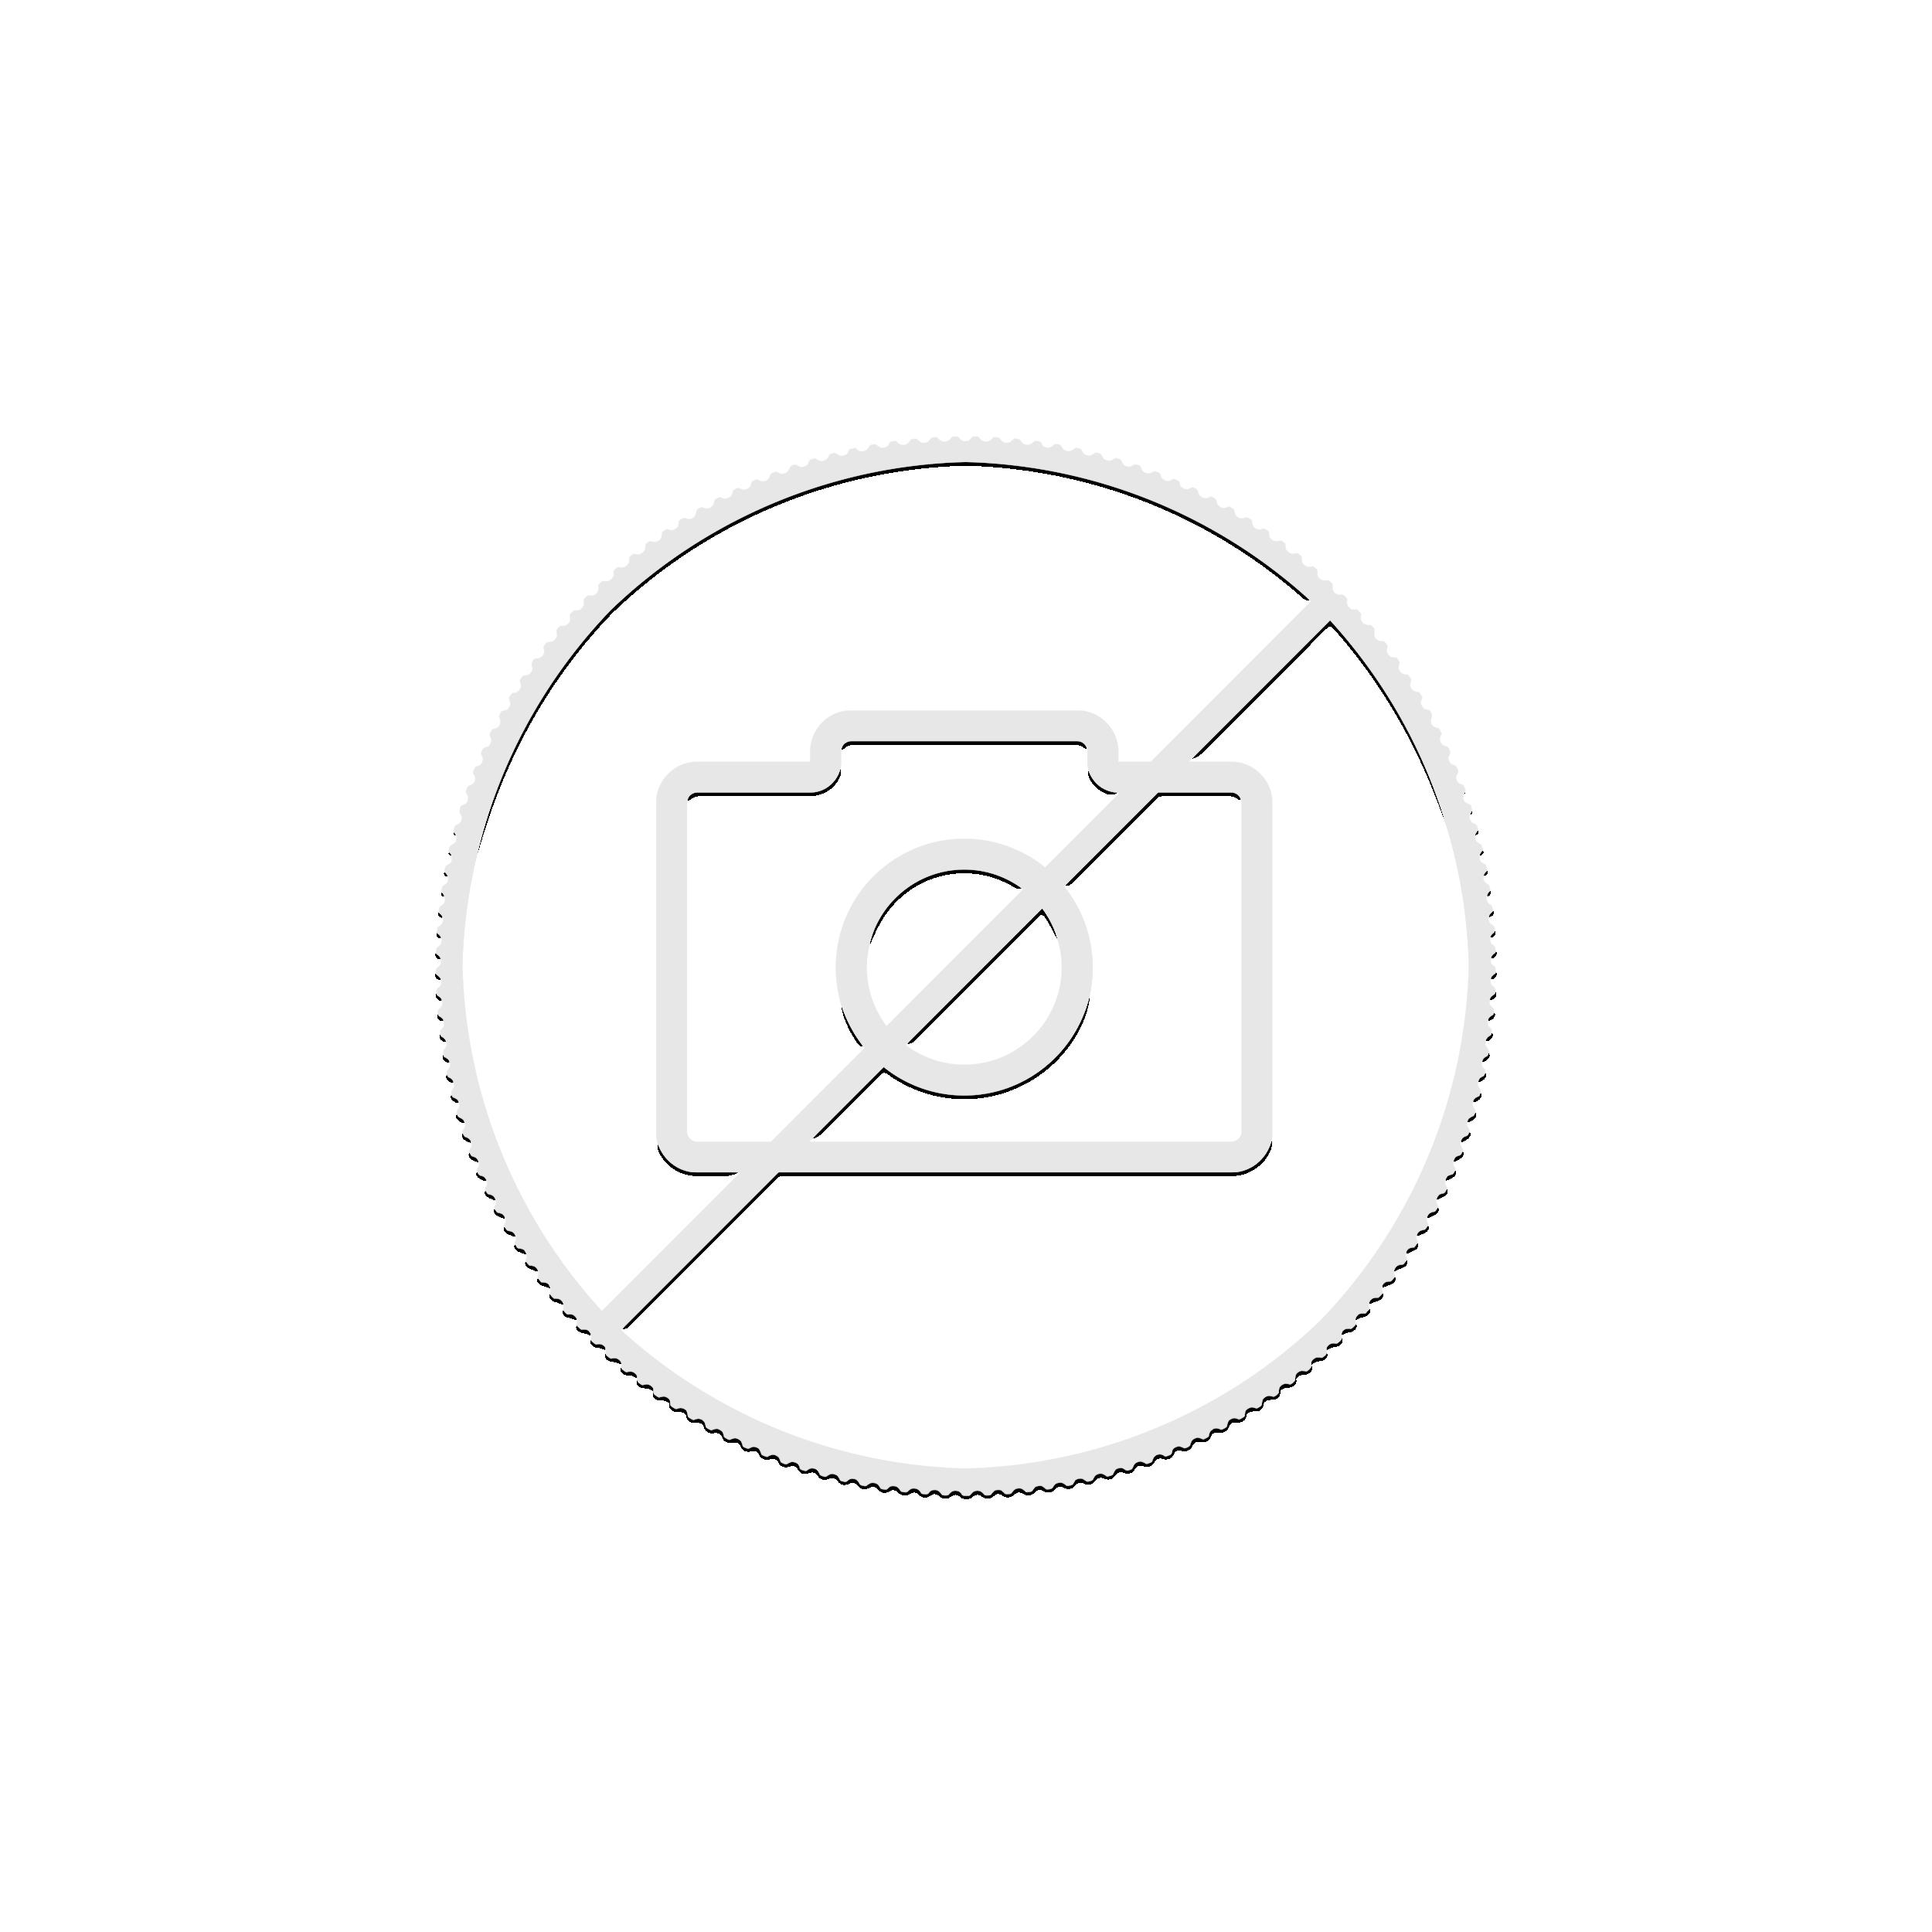 Gouden 1/10 troy ounce Kangaroo munt